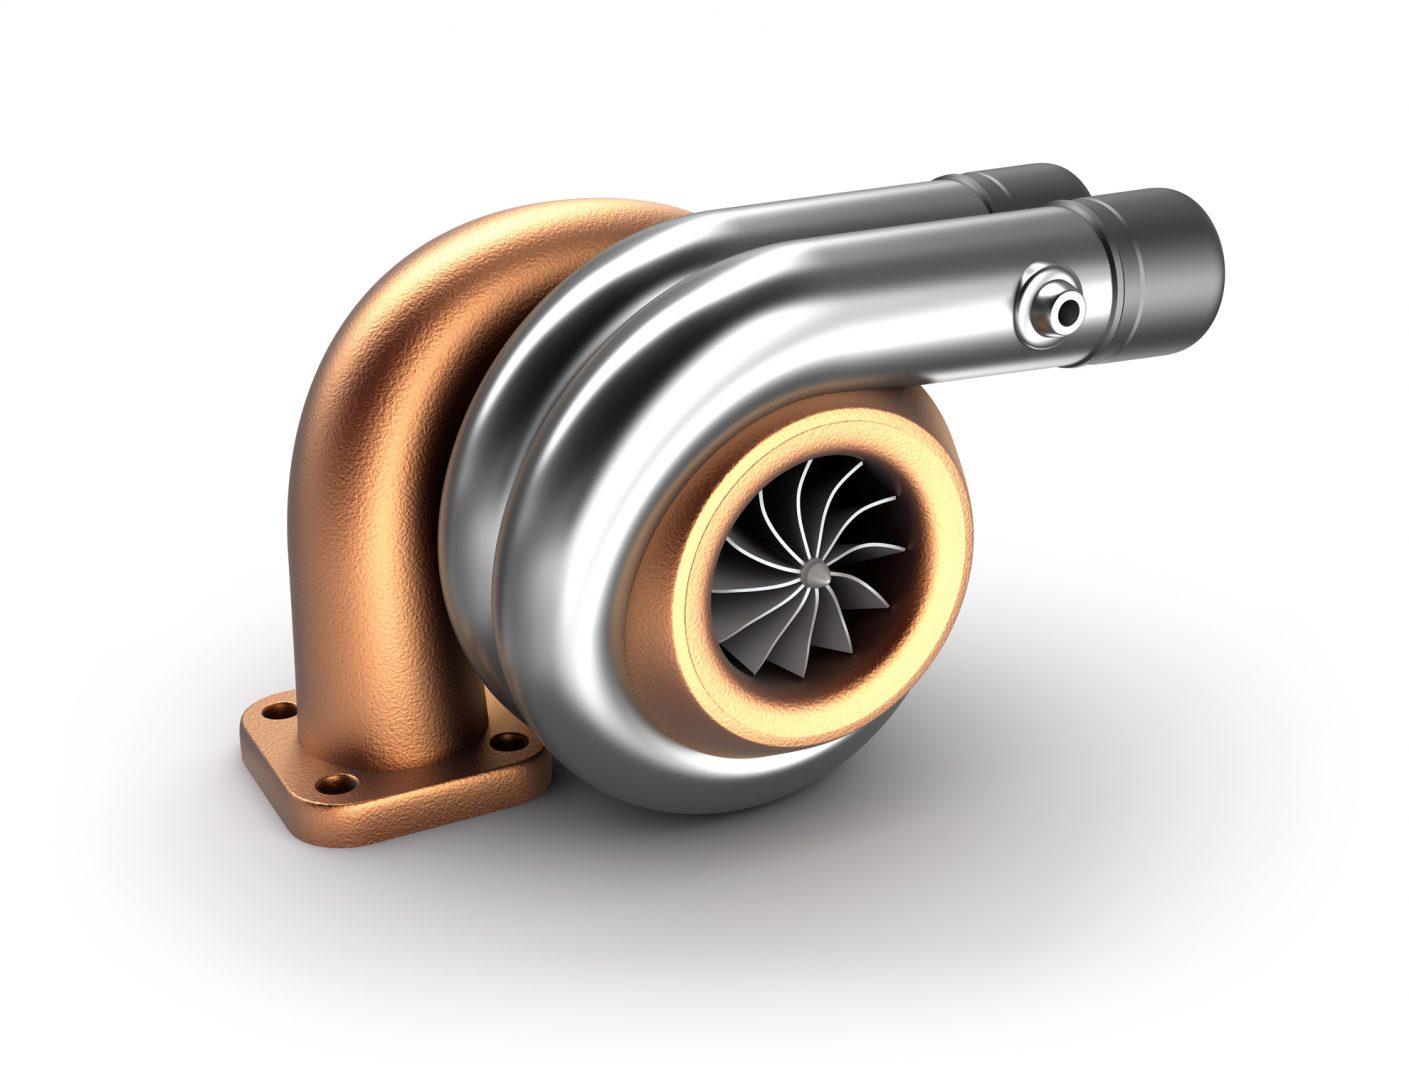 Anodised and polished turbocharger